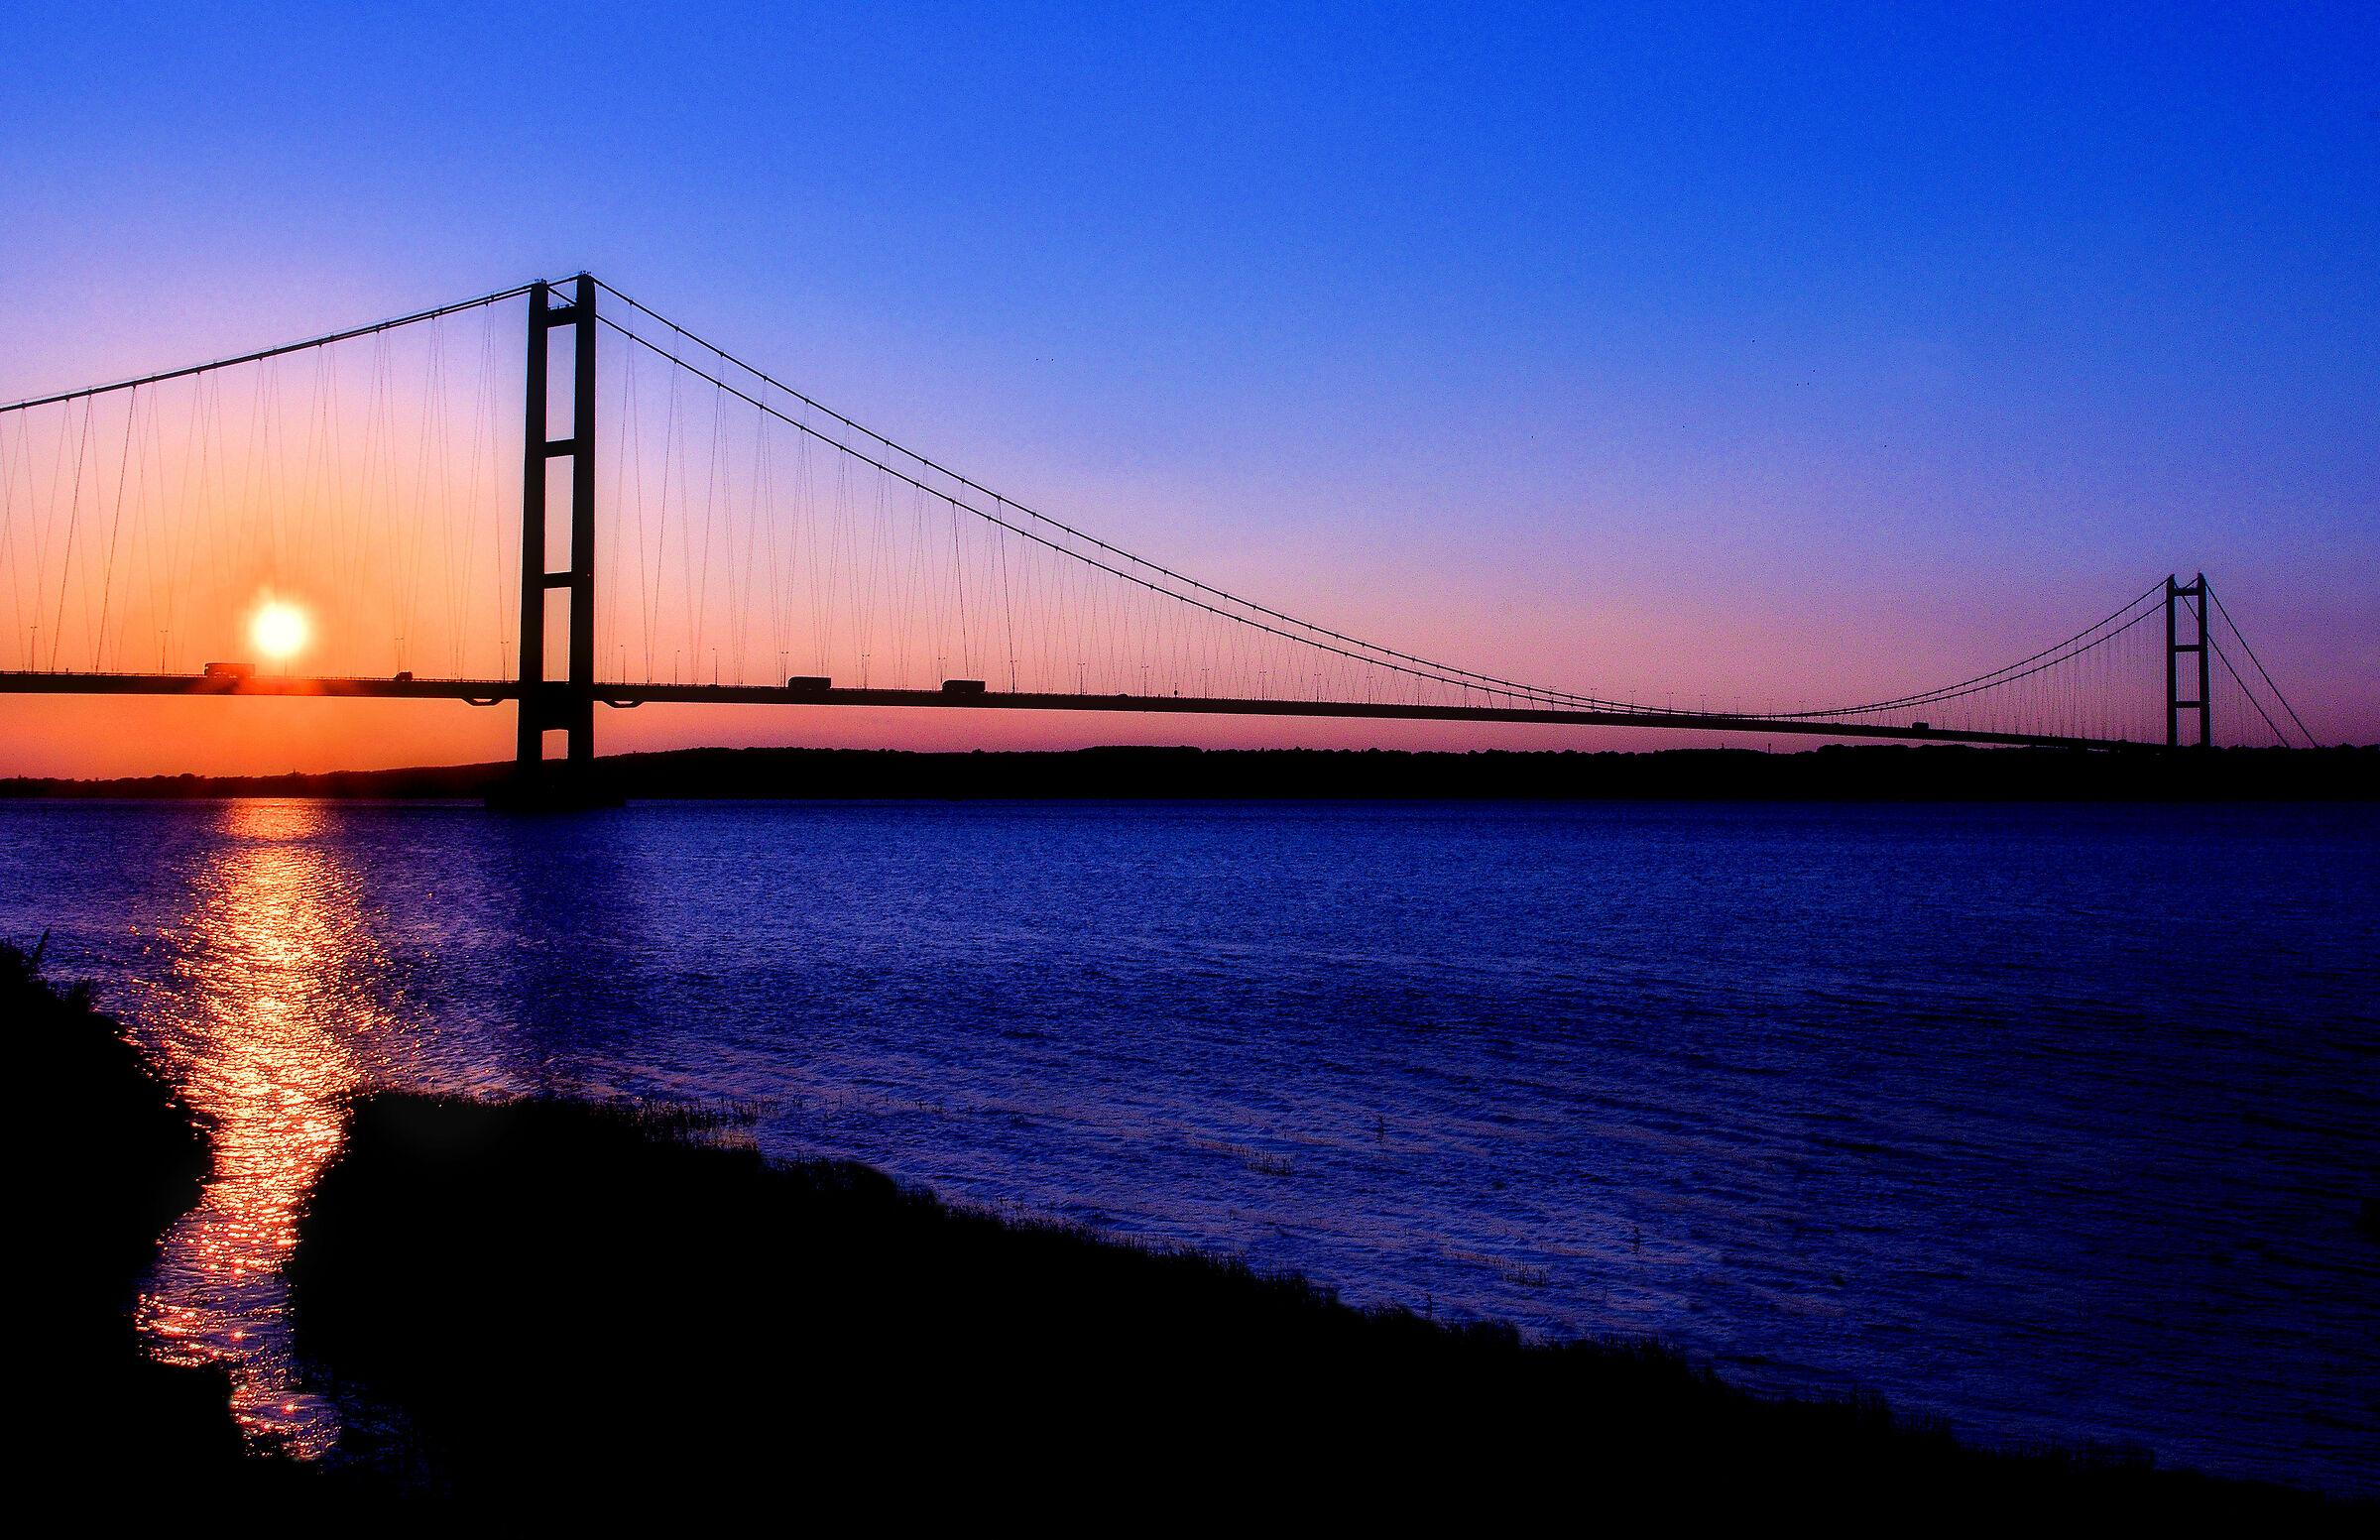 Sunset at Humber Bridge...